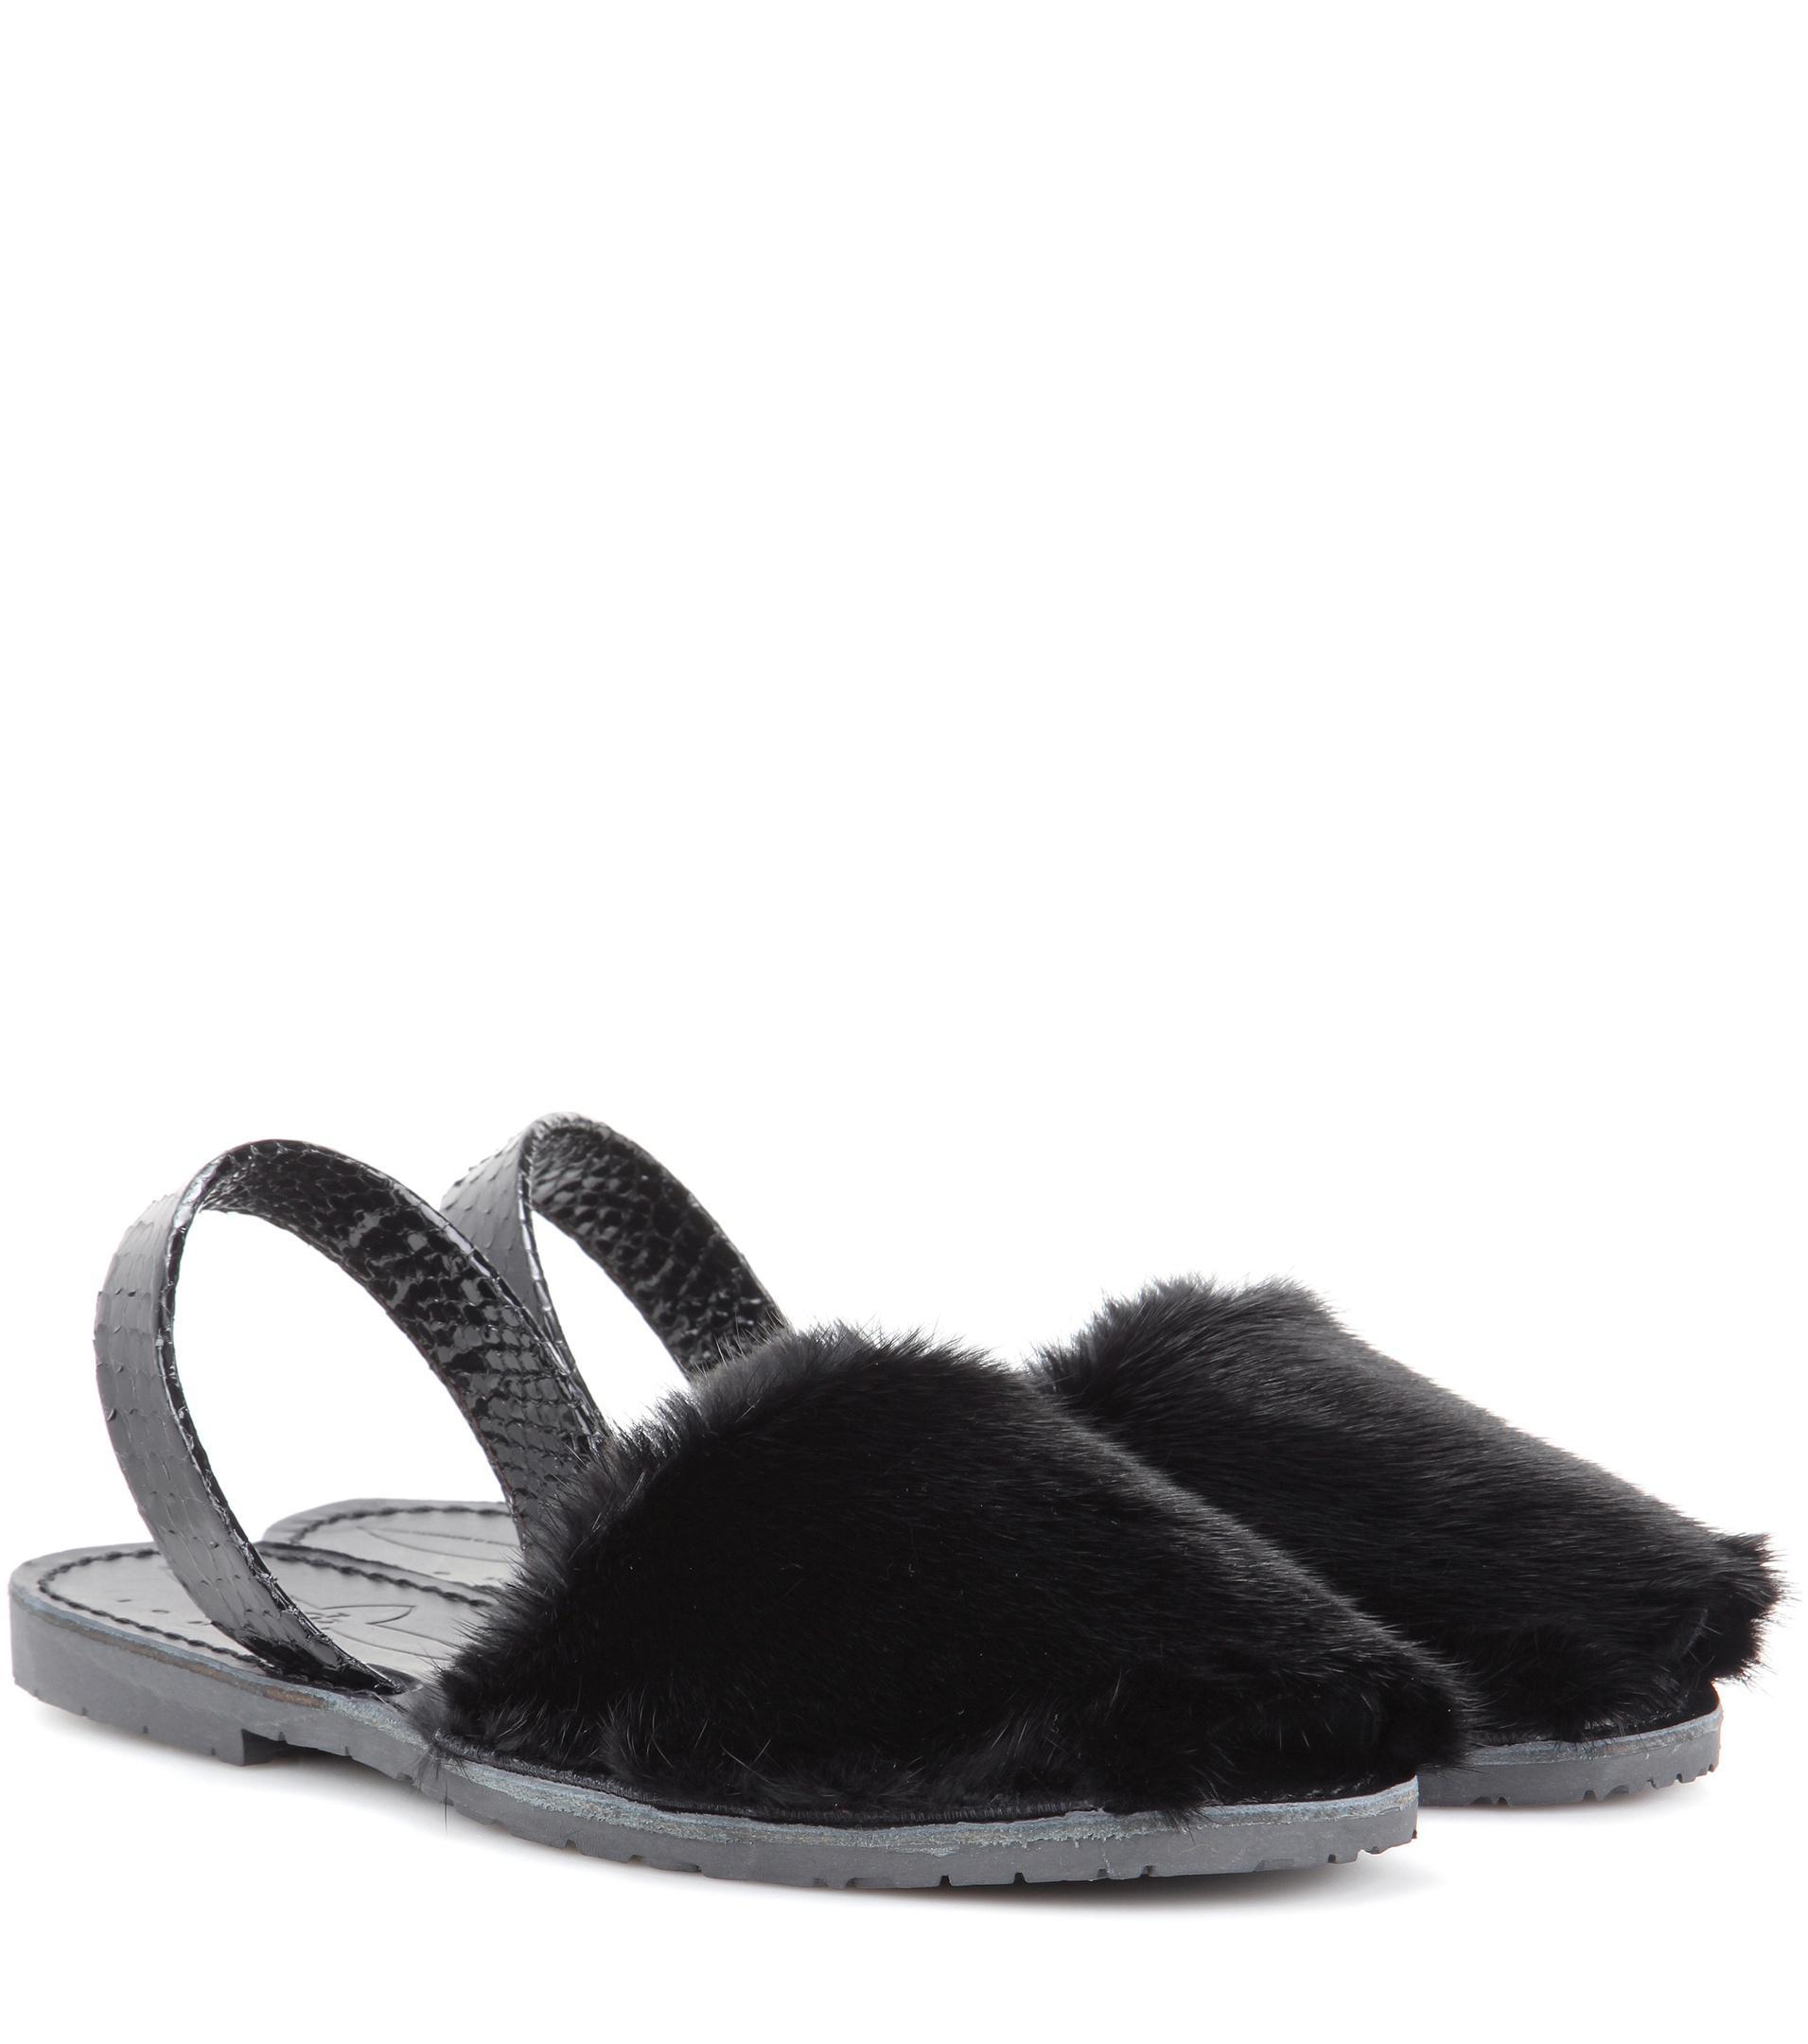 hot sale online d77f1 c5449 del-rio-london-black-Classic-Fur-And-Snakeskin-Sandals.jpeg